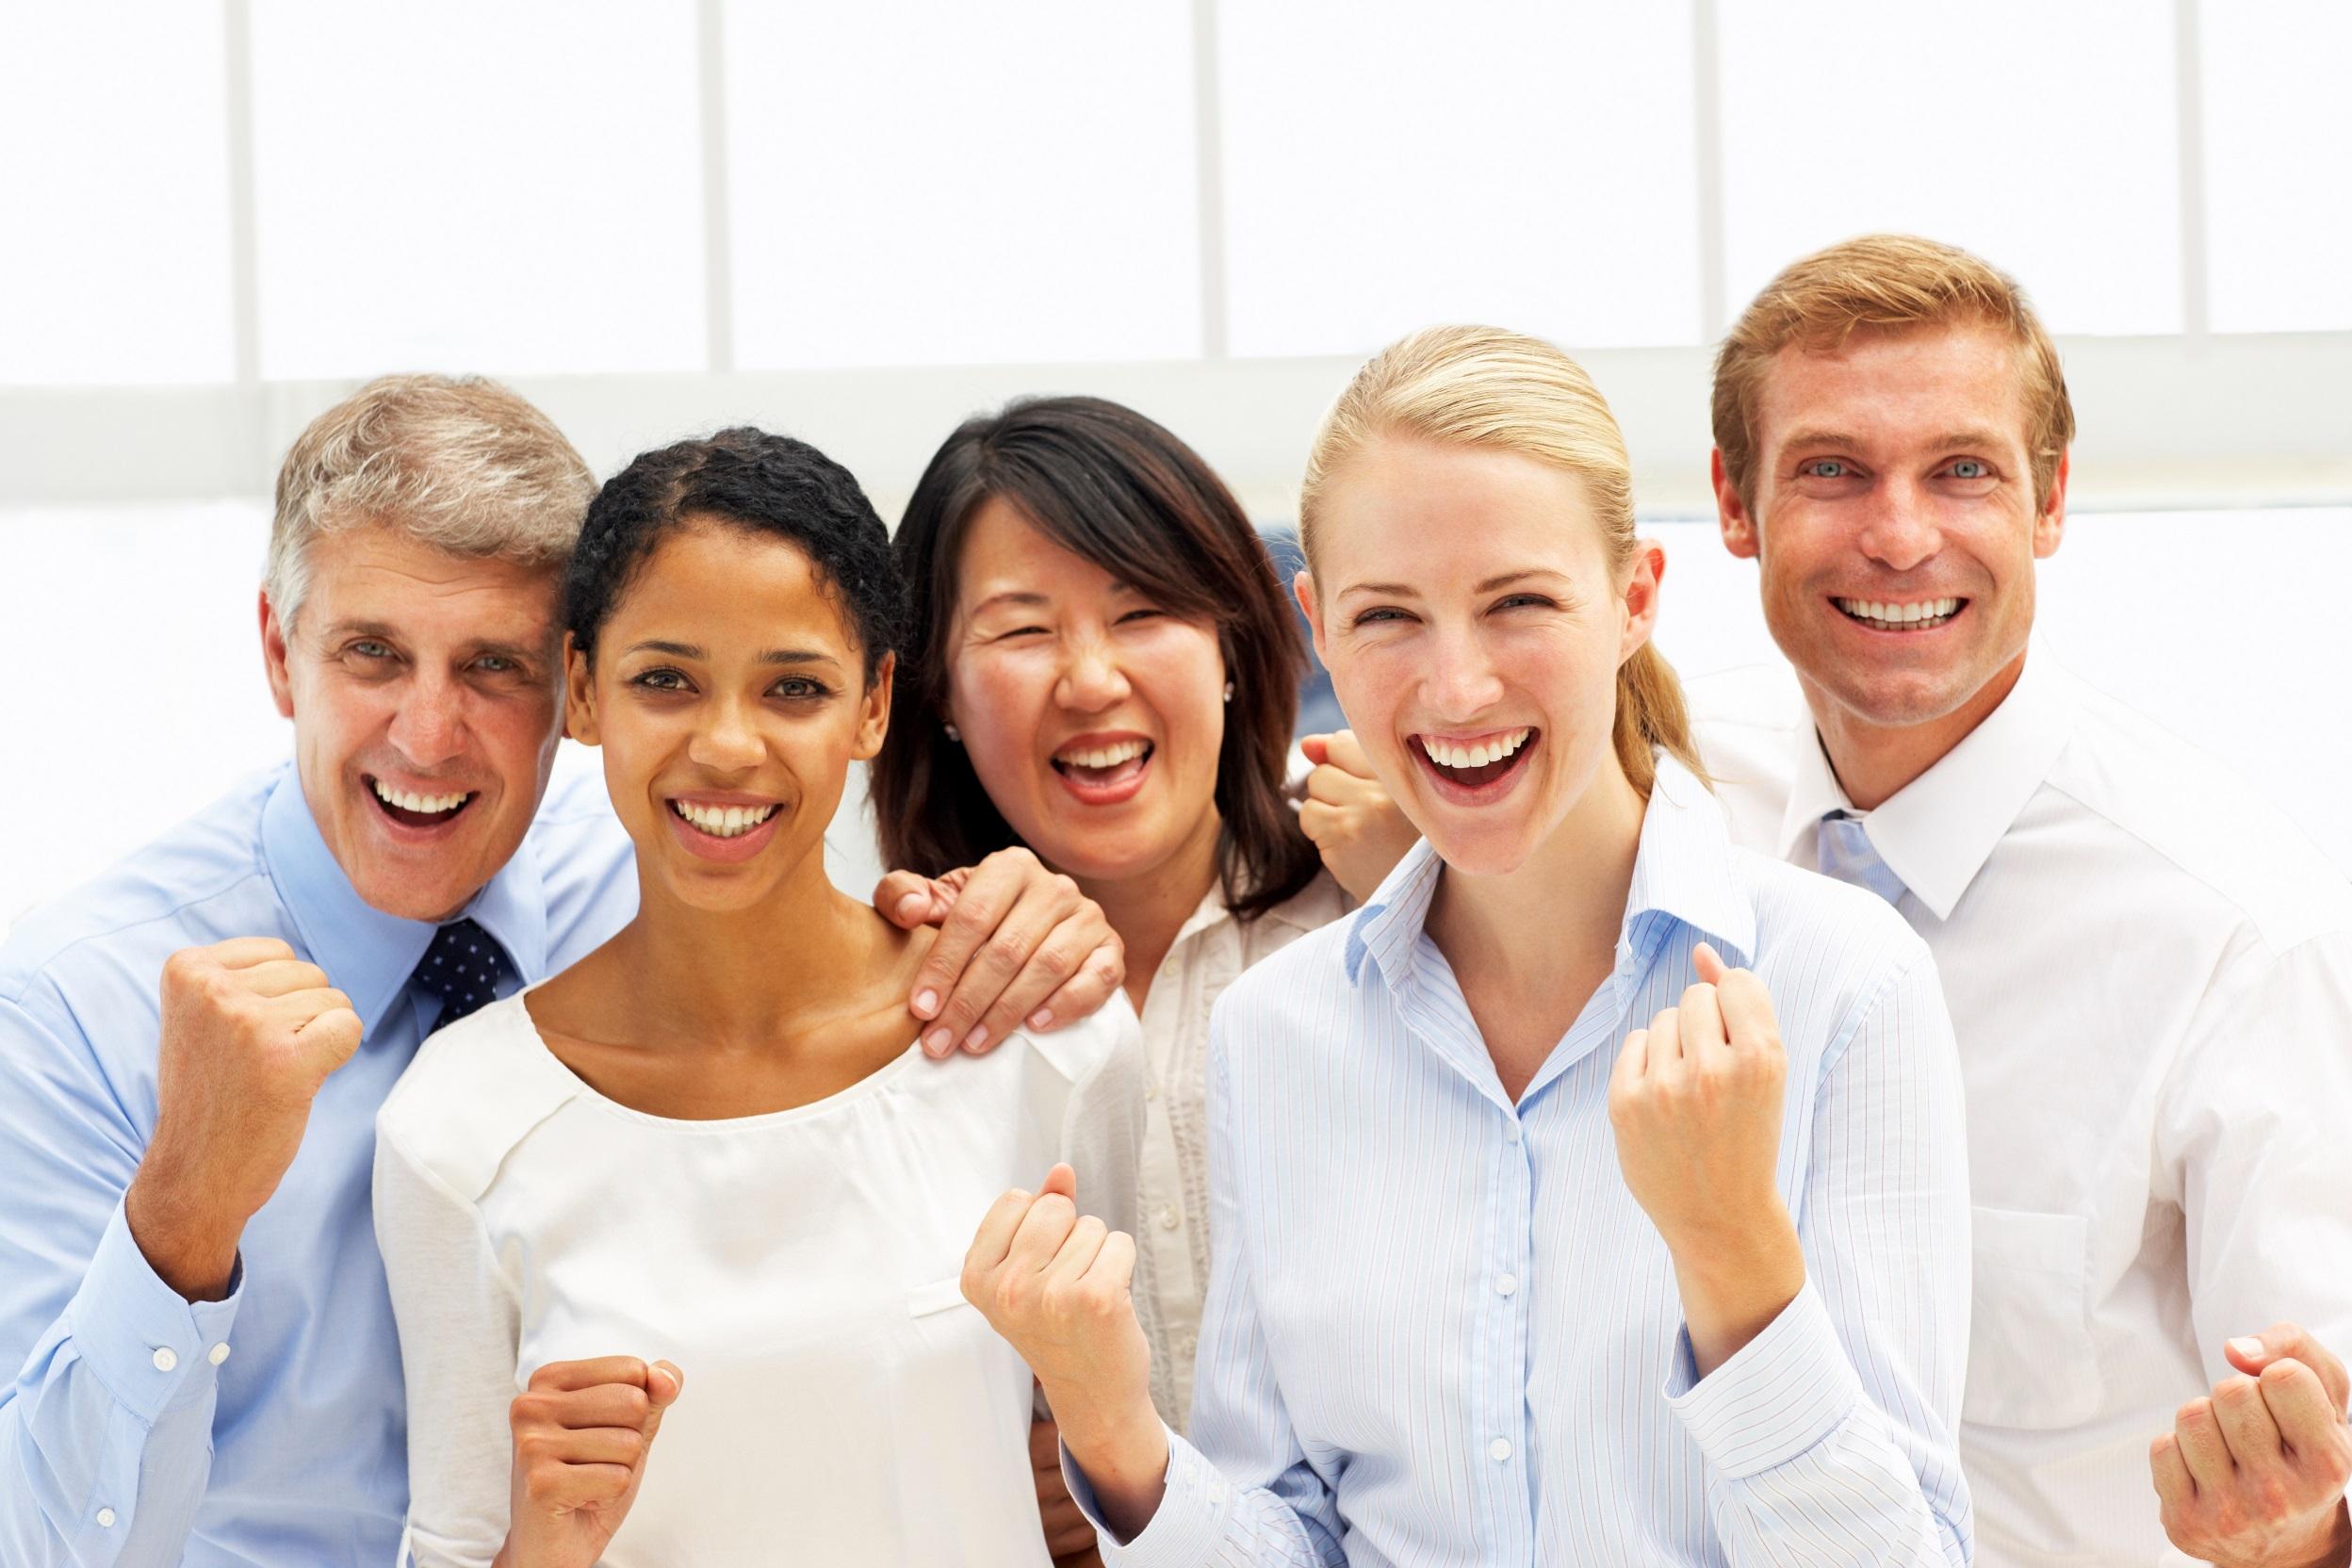 Team Building ( that may actually help build teams )